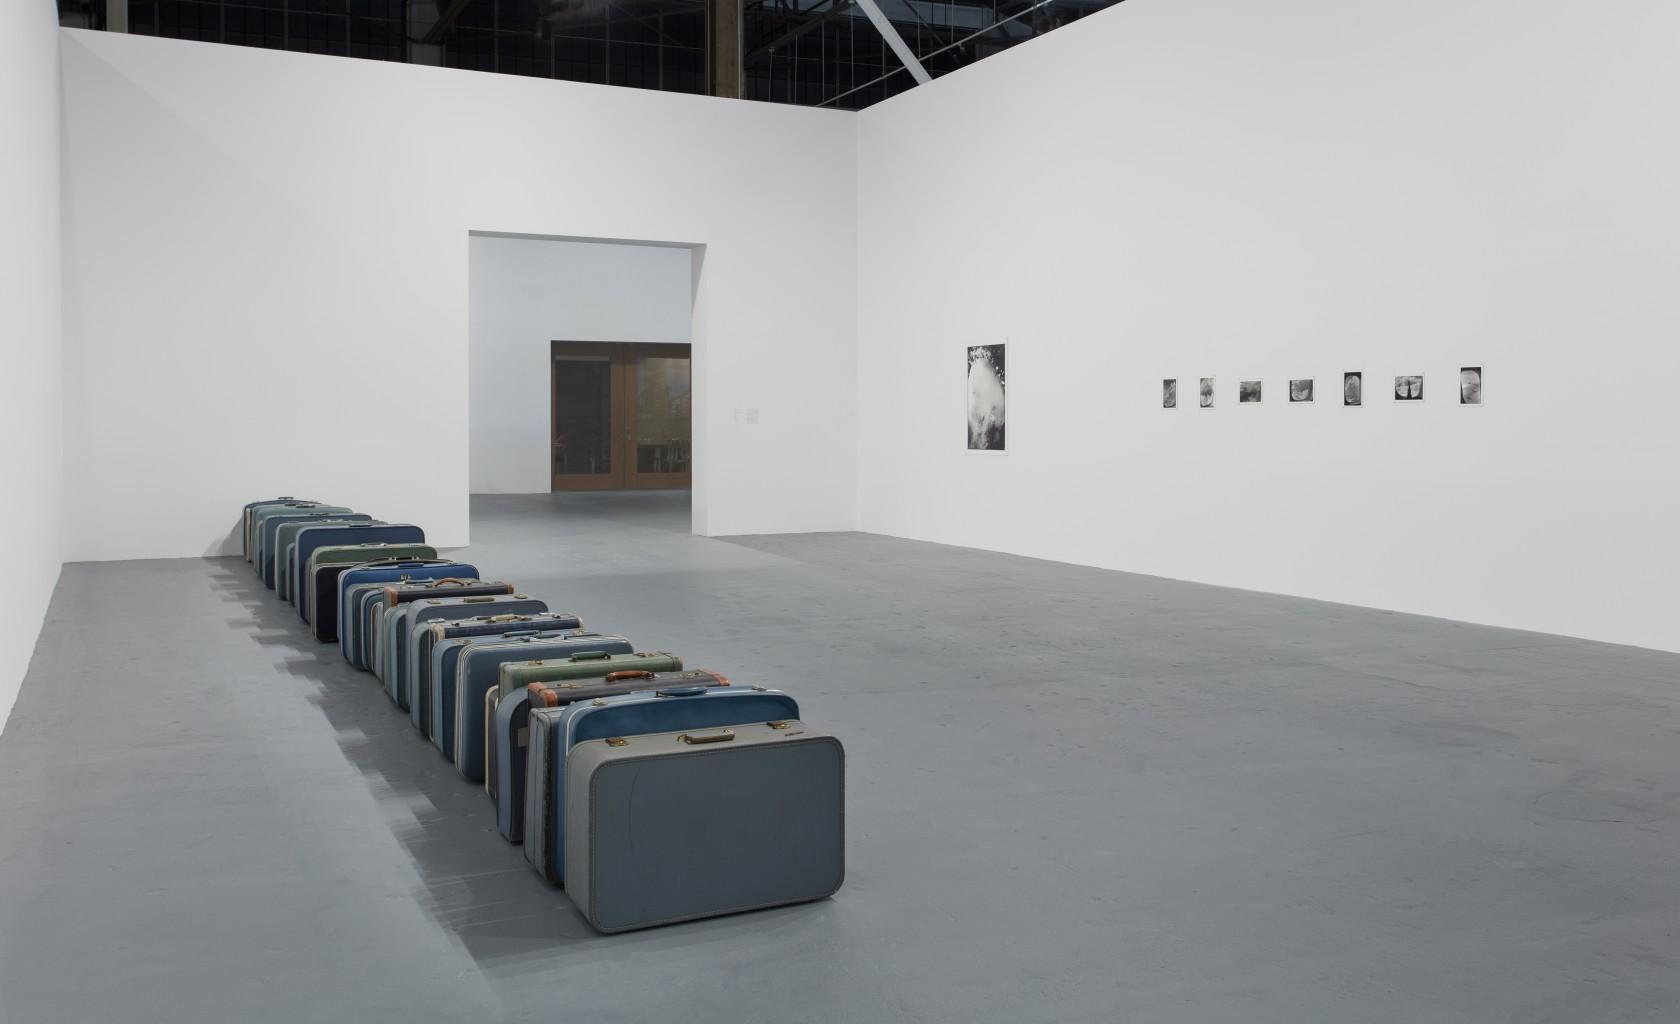 Вид експозиції Зої Леонард: Survey, 11 листопада 2018 року - 25 березня 2019 року у Geffen Contemporary в MOCA, надано Музеєм сучасного мистецтва, Лос-Анджелес, фото Брайана Форреста